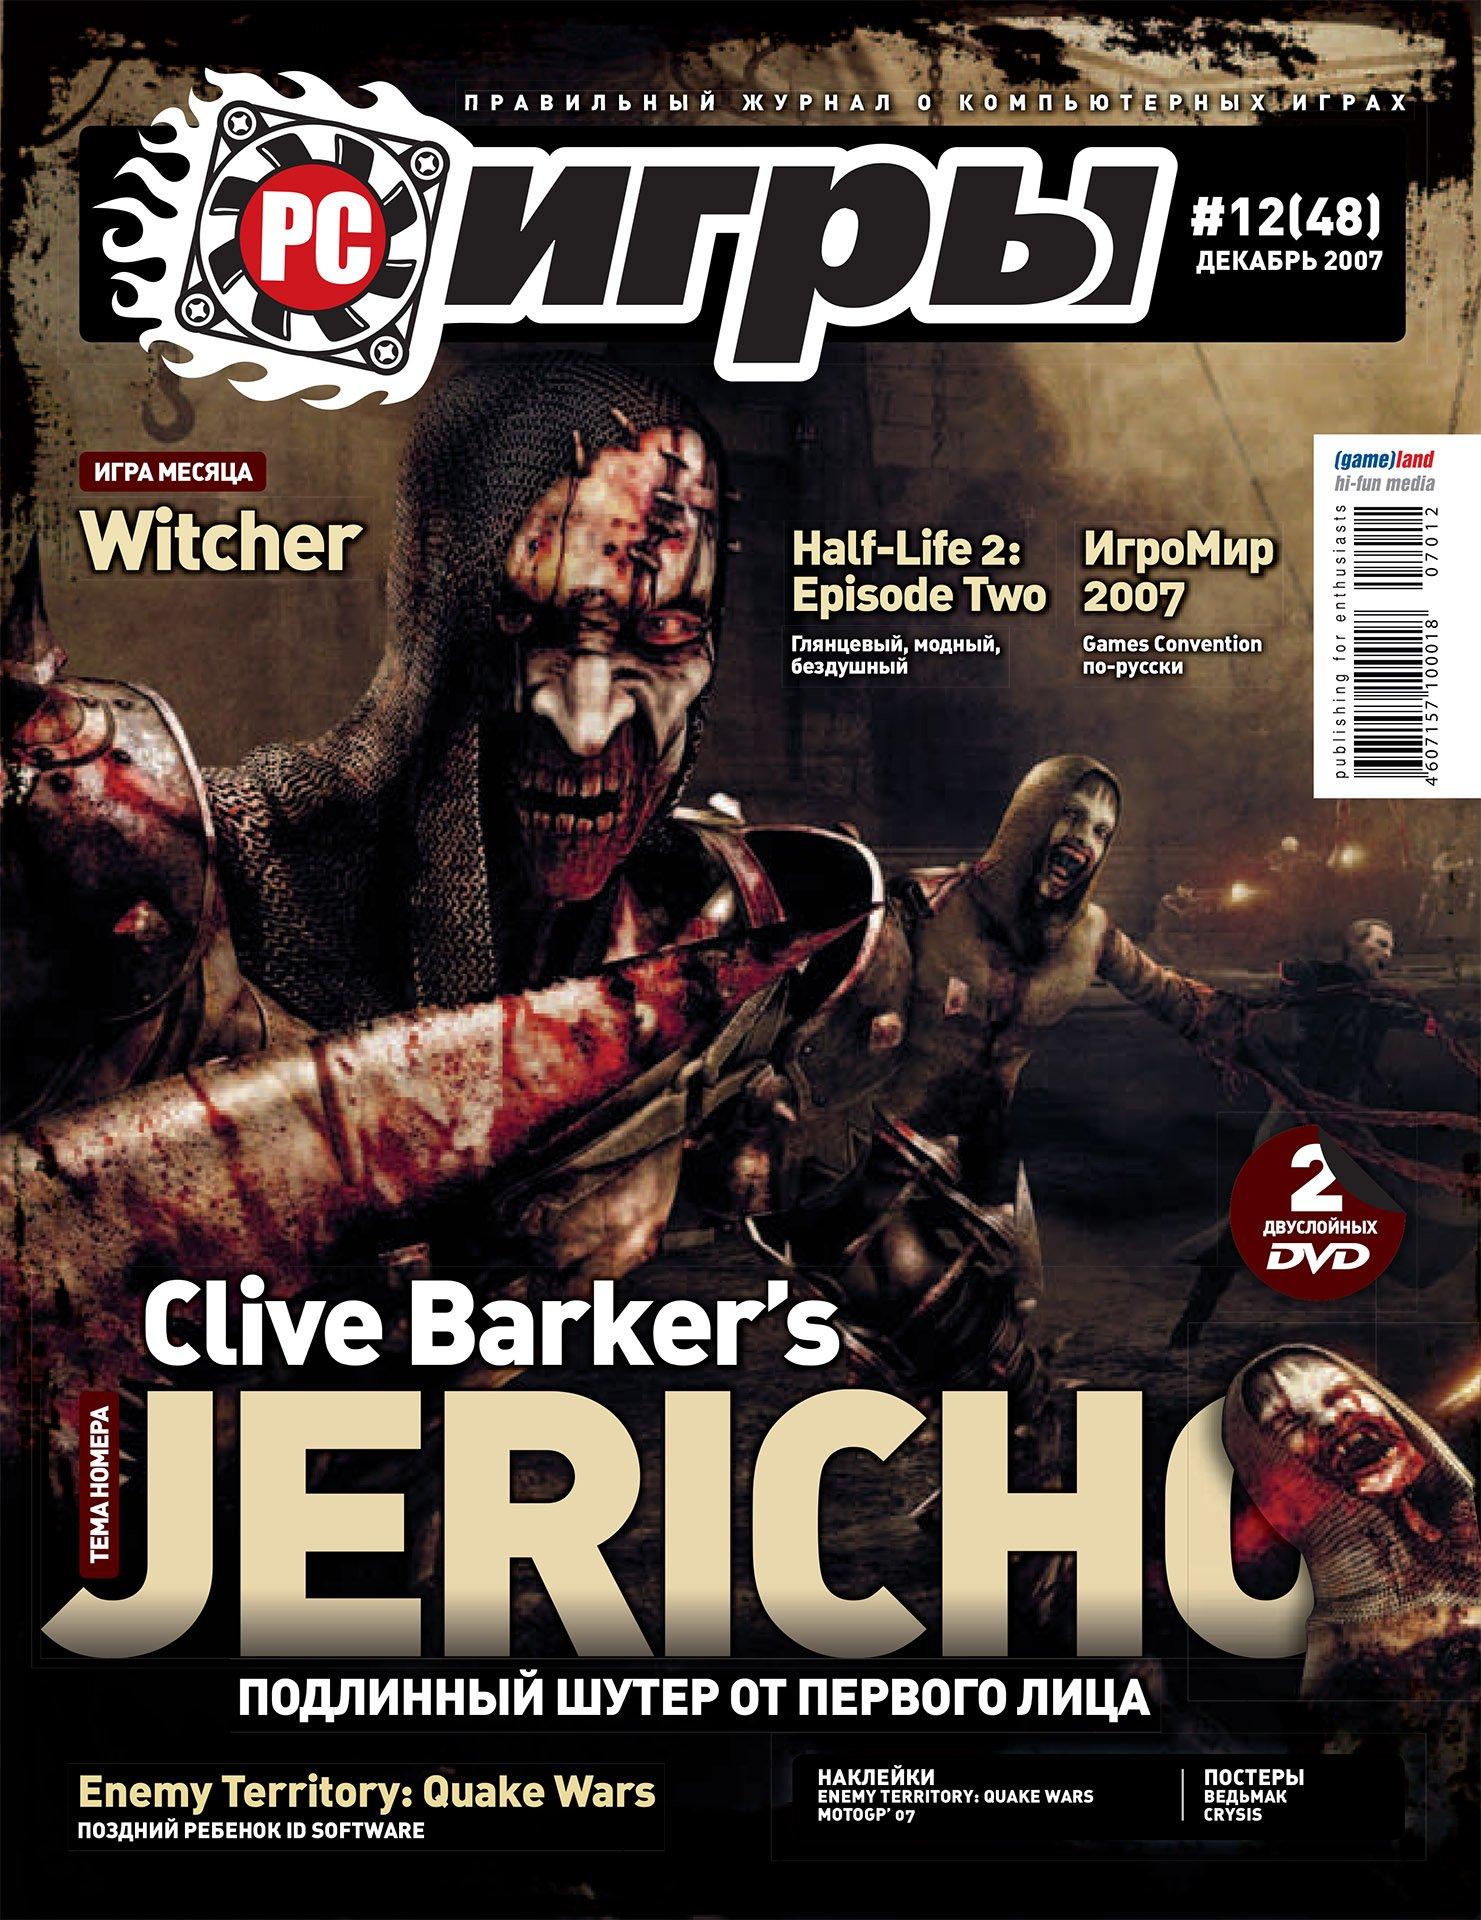 PC Games 48 December 2007